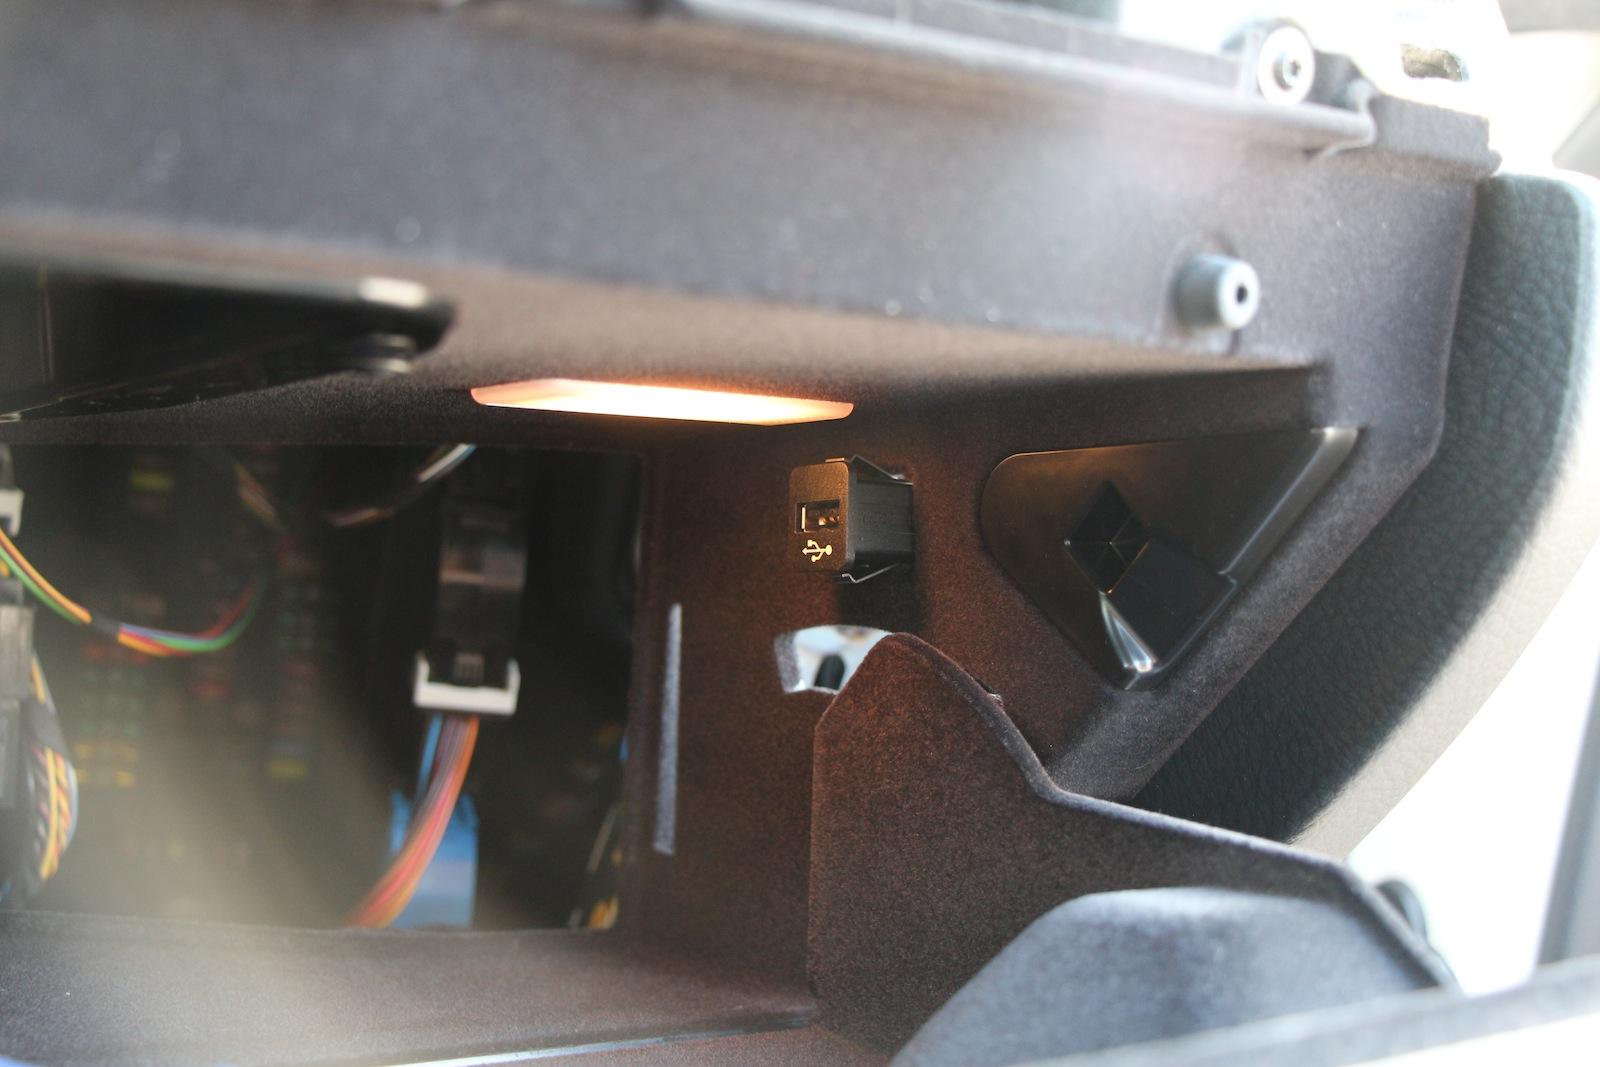 Retrofitting Navigation on my F10 - 2010 2011 BMW 5 Series